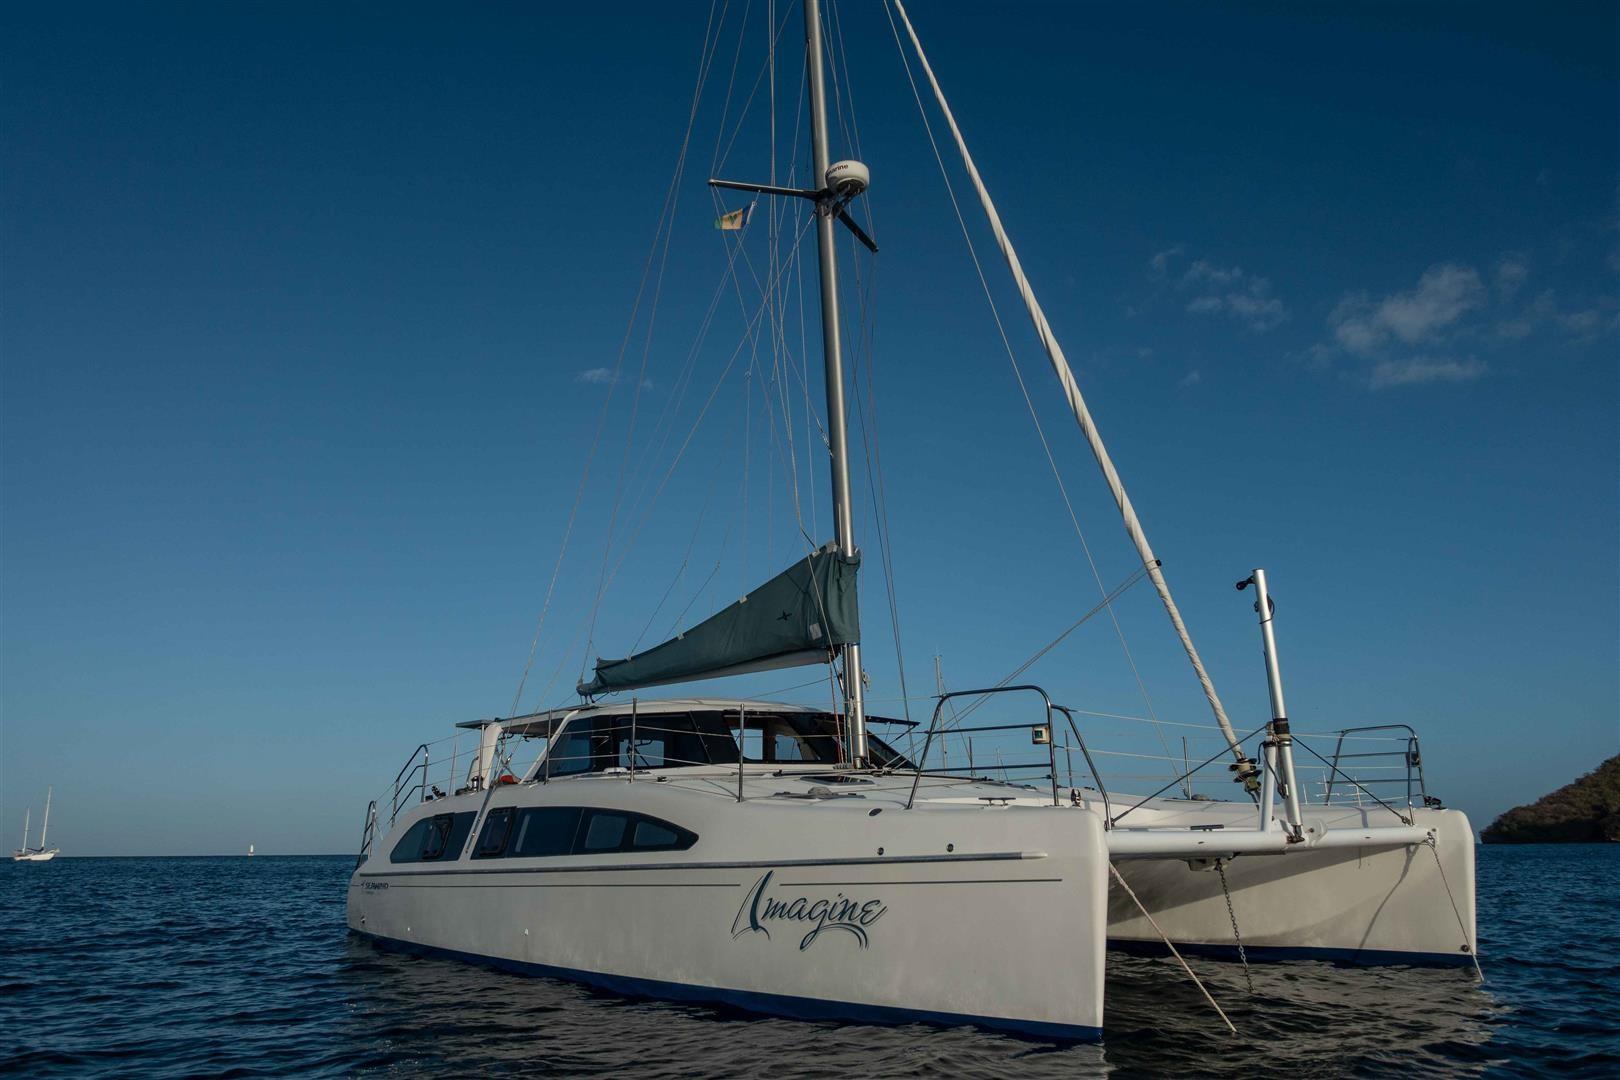 38 Seawind Imagine 2007 St  Georges | Denison Yacht Sales